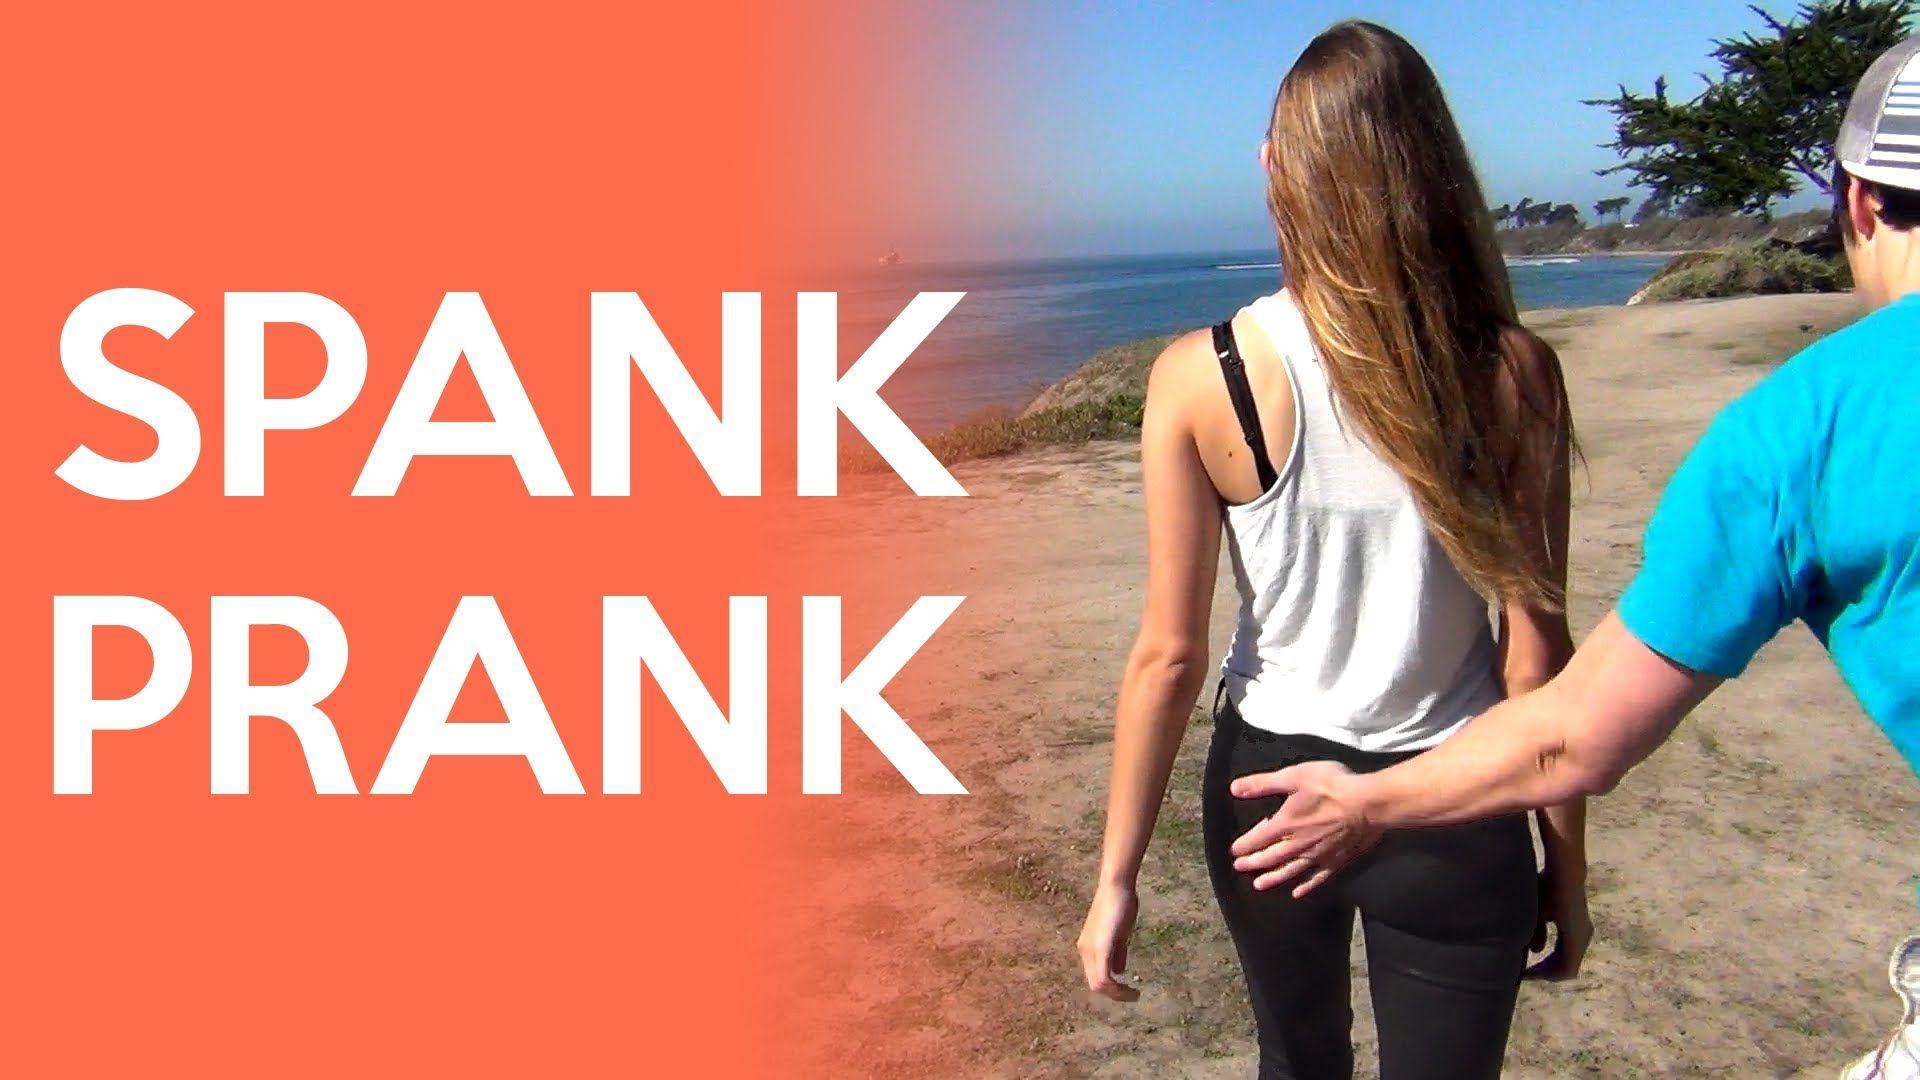 Escaped Gorilla Bathroom Prank spank prank | video | pinterest | humor